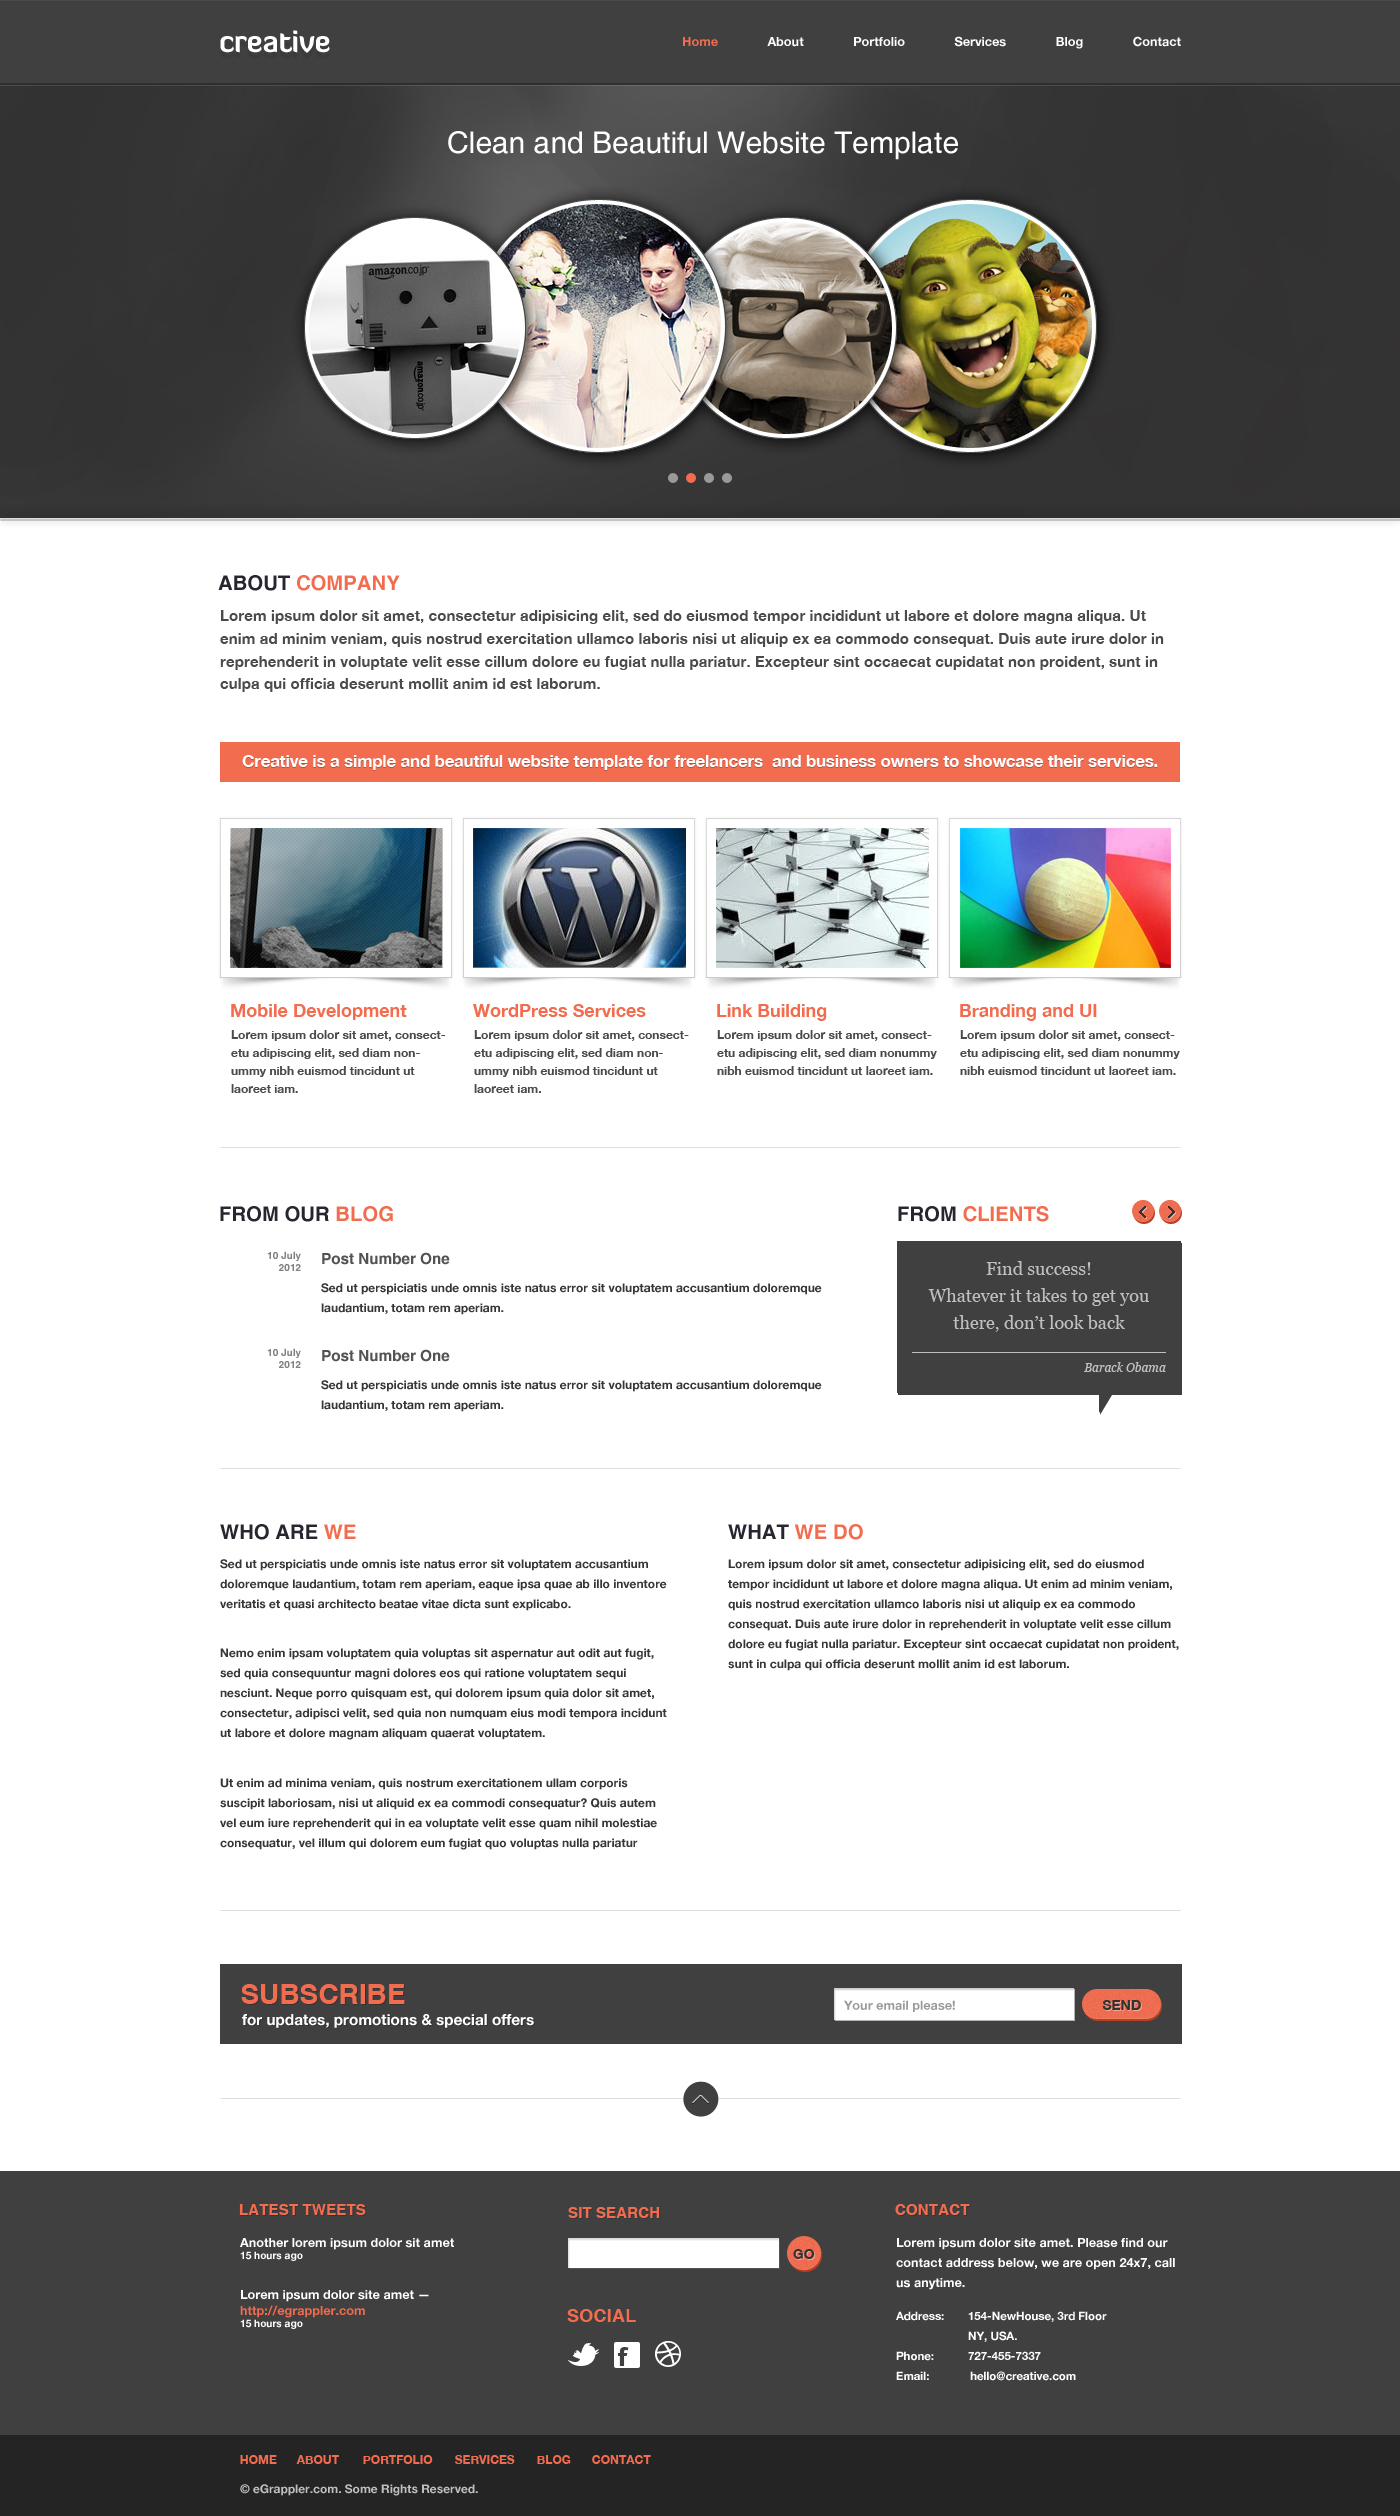 Free business portfolio website psd template creative free business and portfolio website psd template creative accmission Choice Image